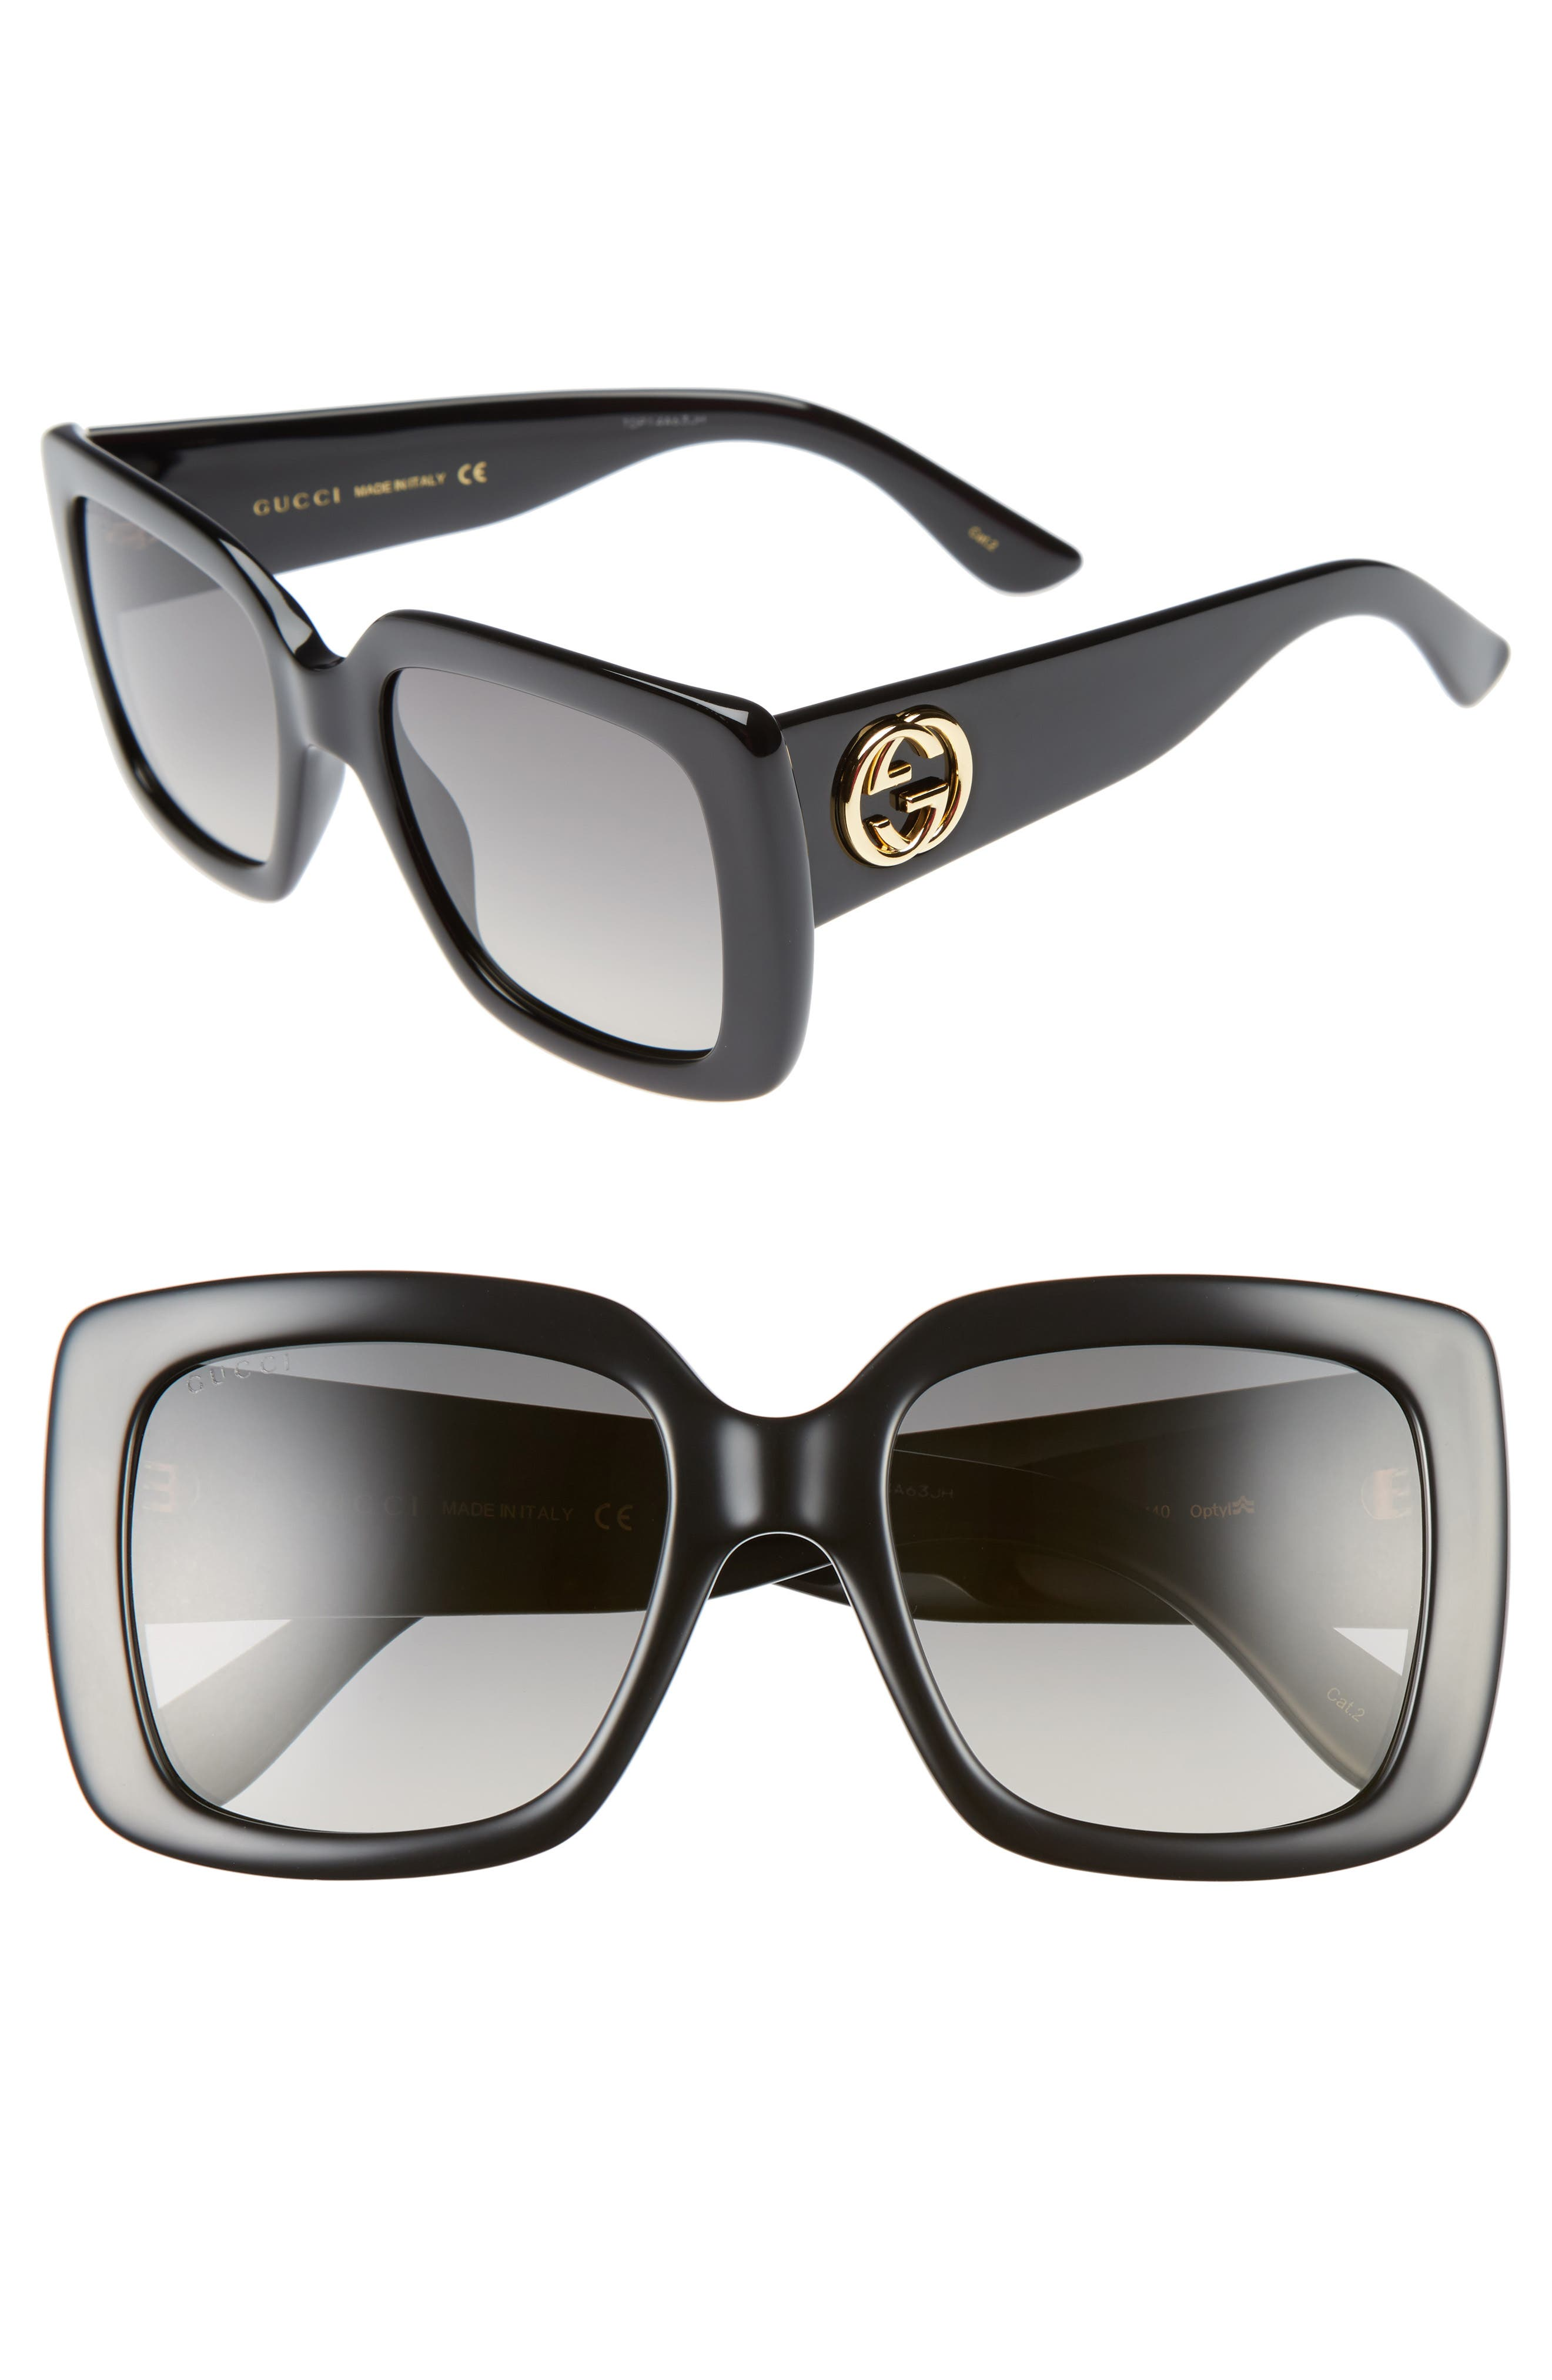 53mm Square Sunglasses,                         Main,                         color, BLACK/ GREY